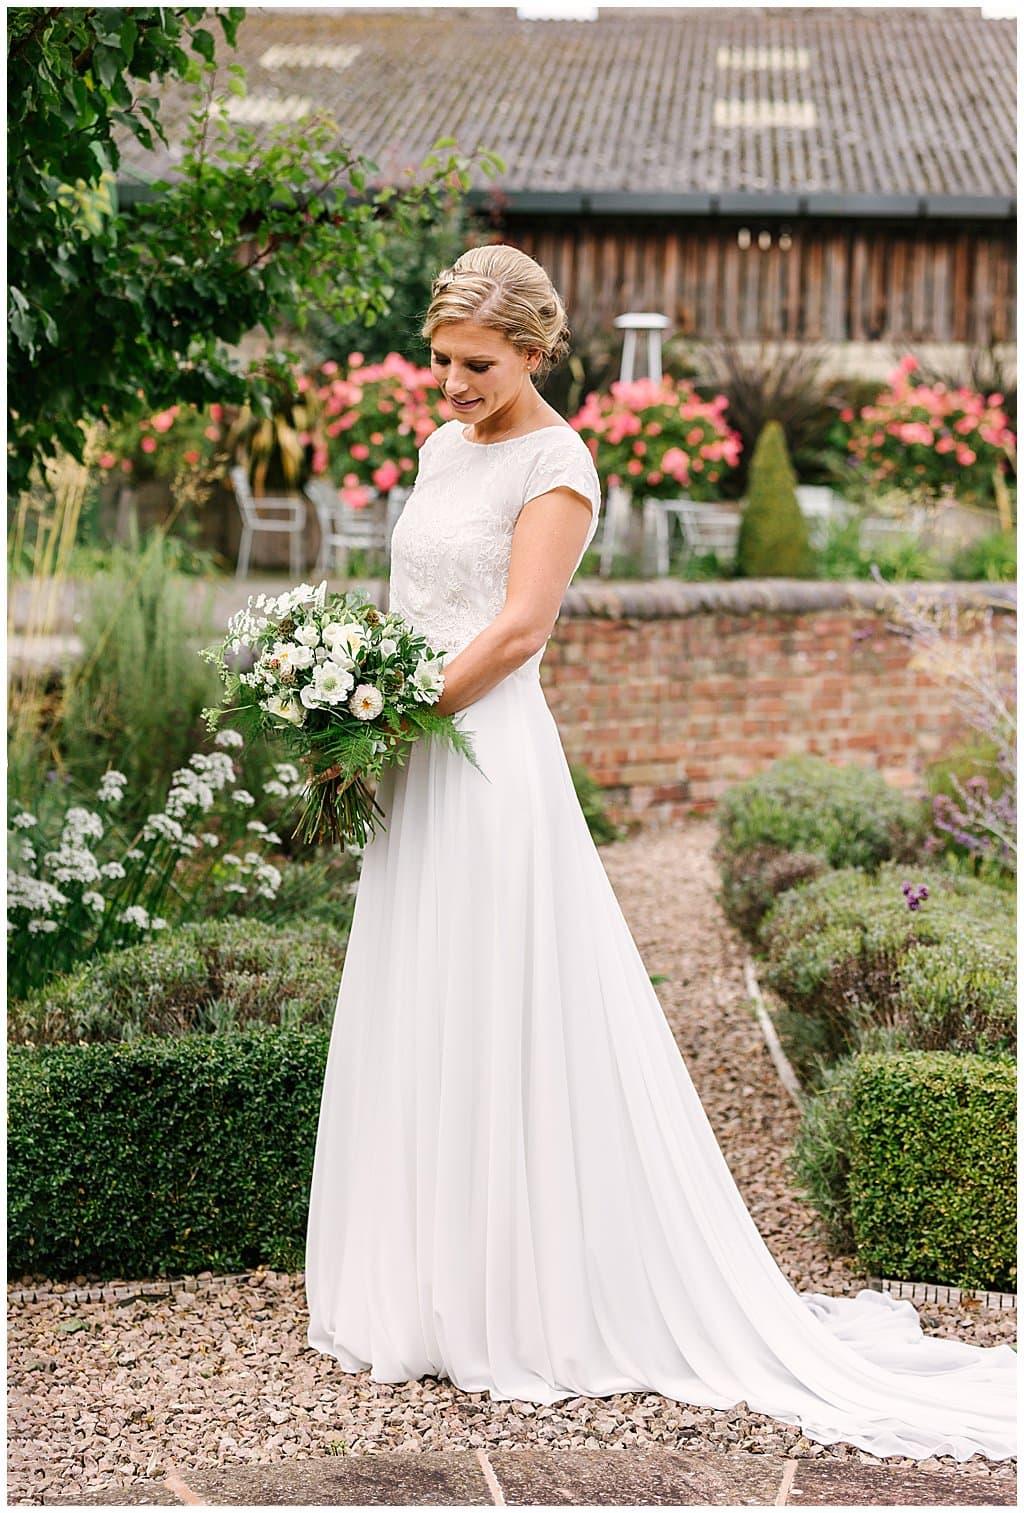 Portrait of Bride wearing Dana Bolton wedding dress in the gardens of Eckington Manor